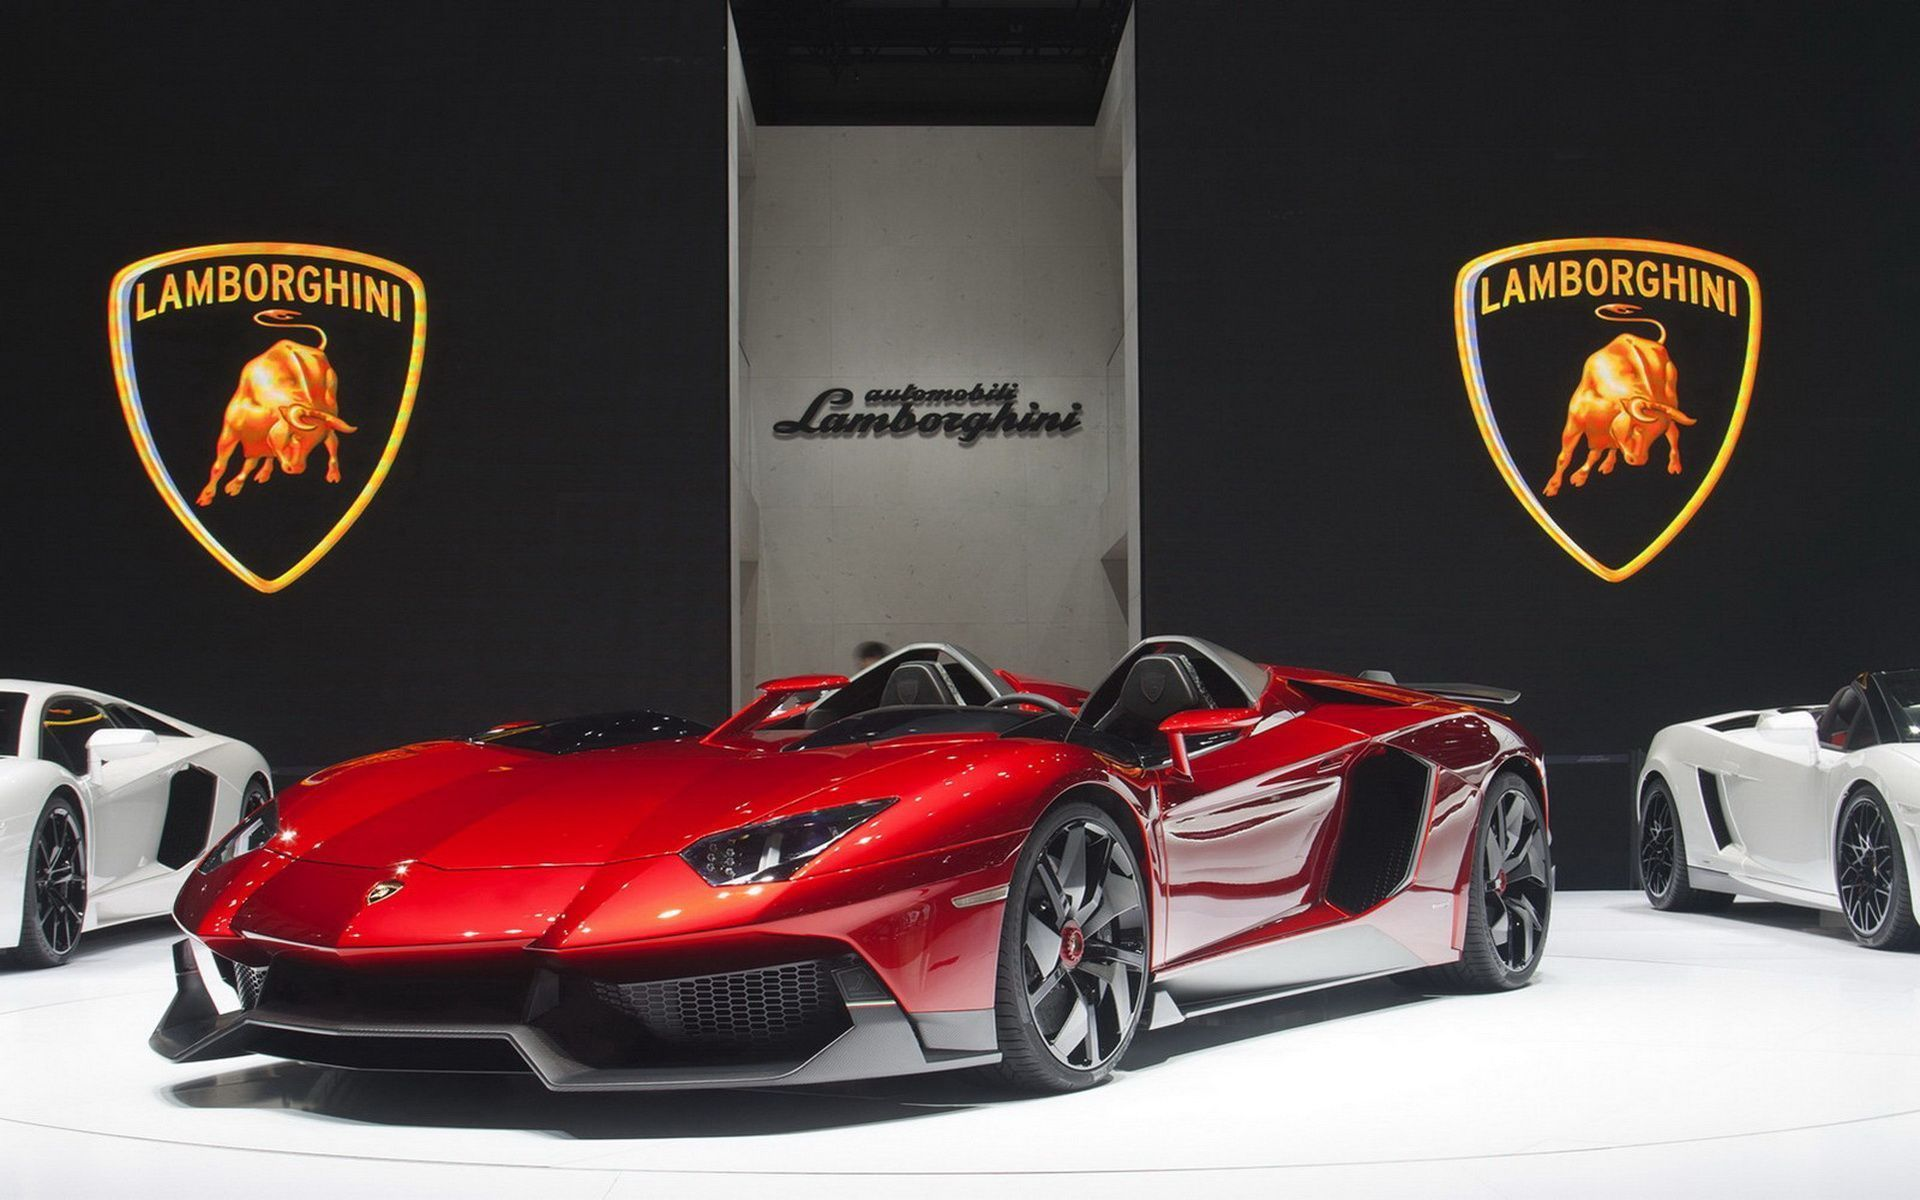 Superbe Lamborghini Aventador J Wallpaper HD